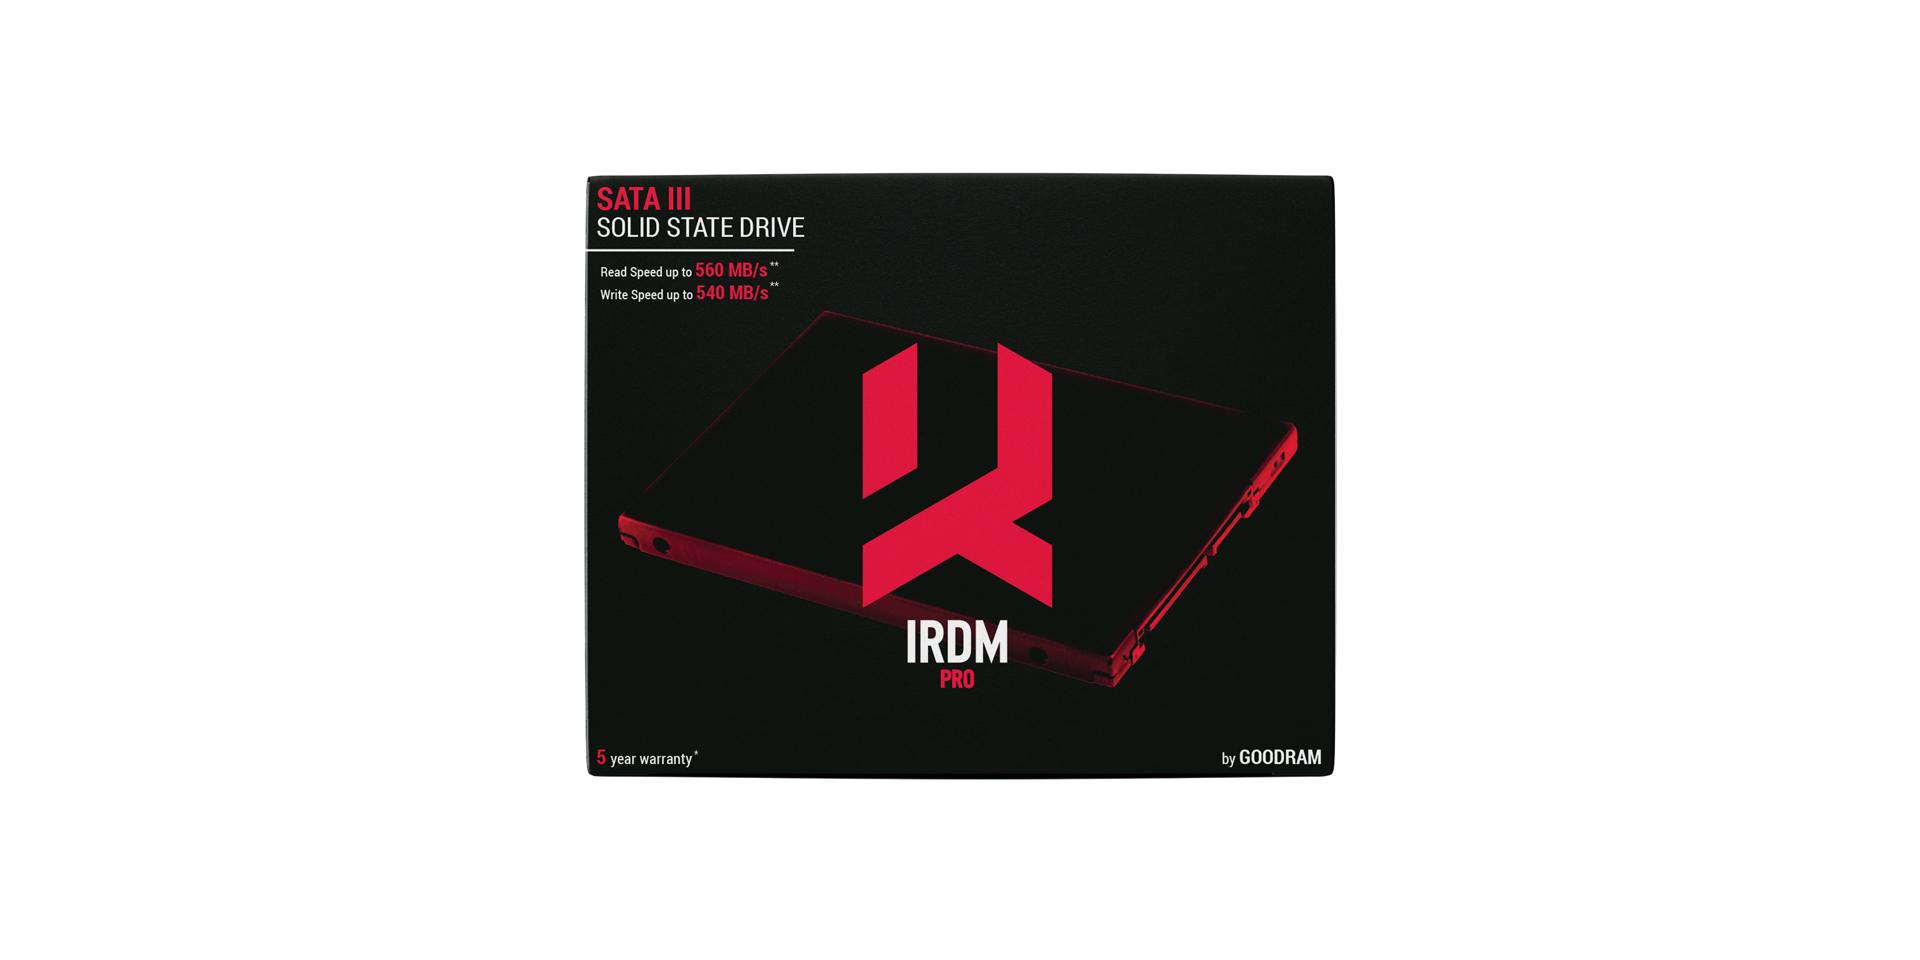 IRDM PRO SSD box